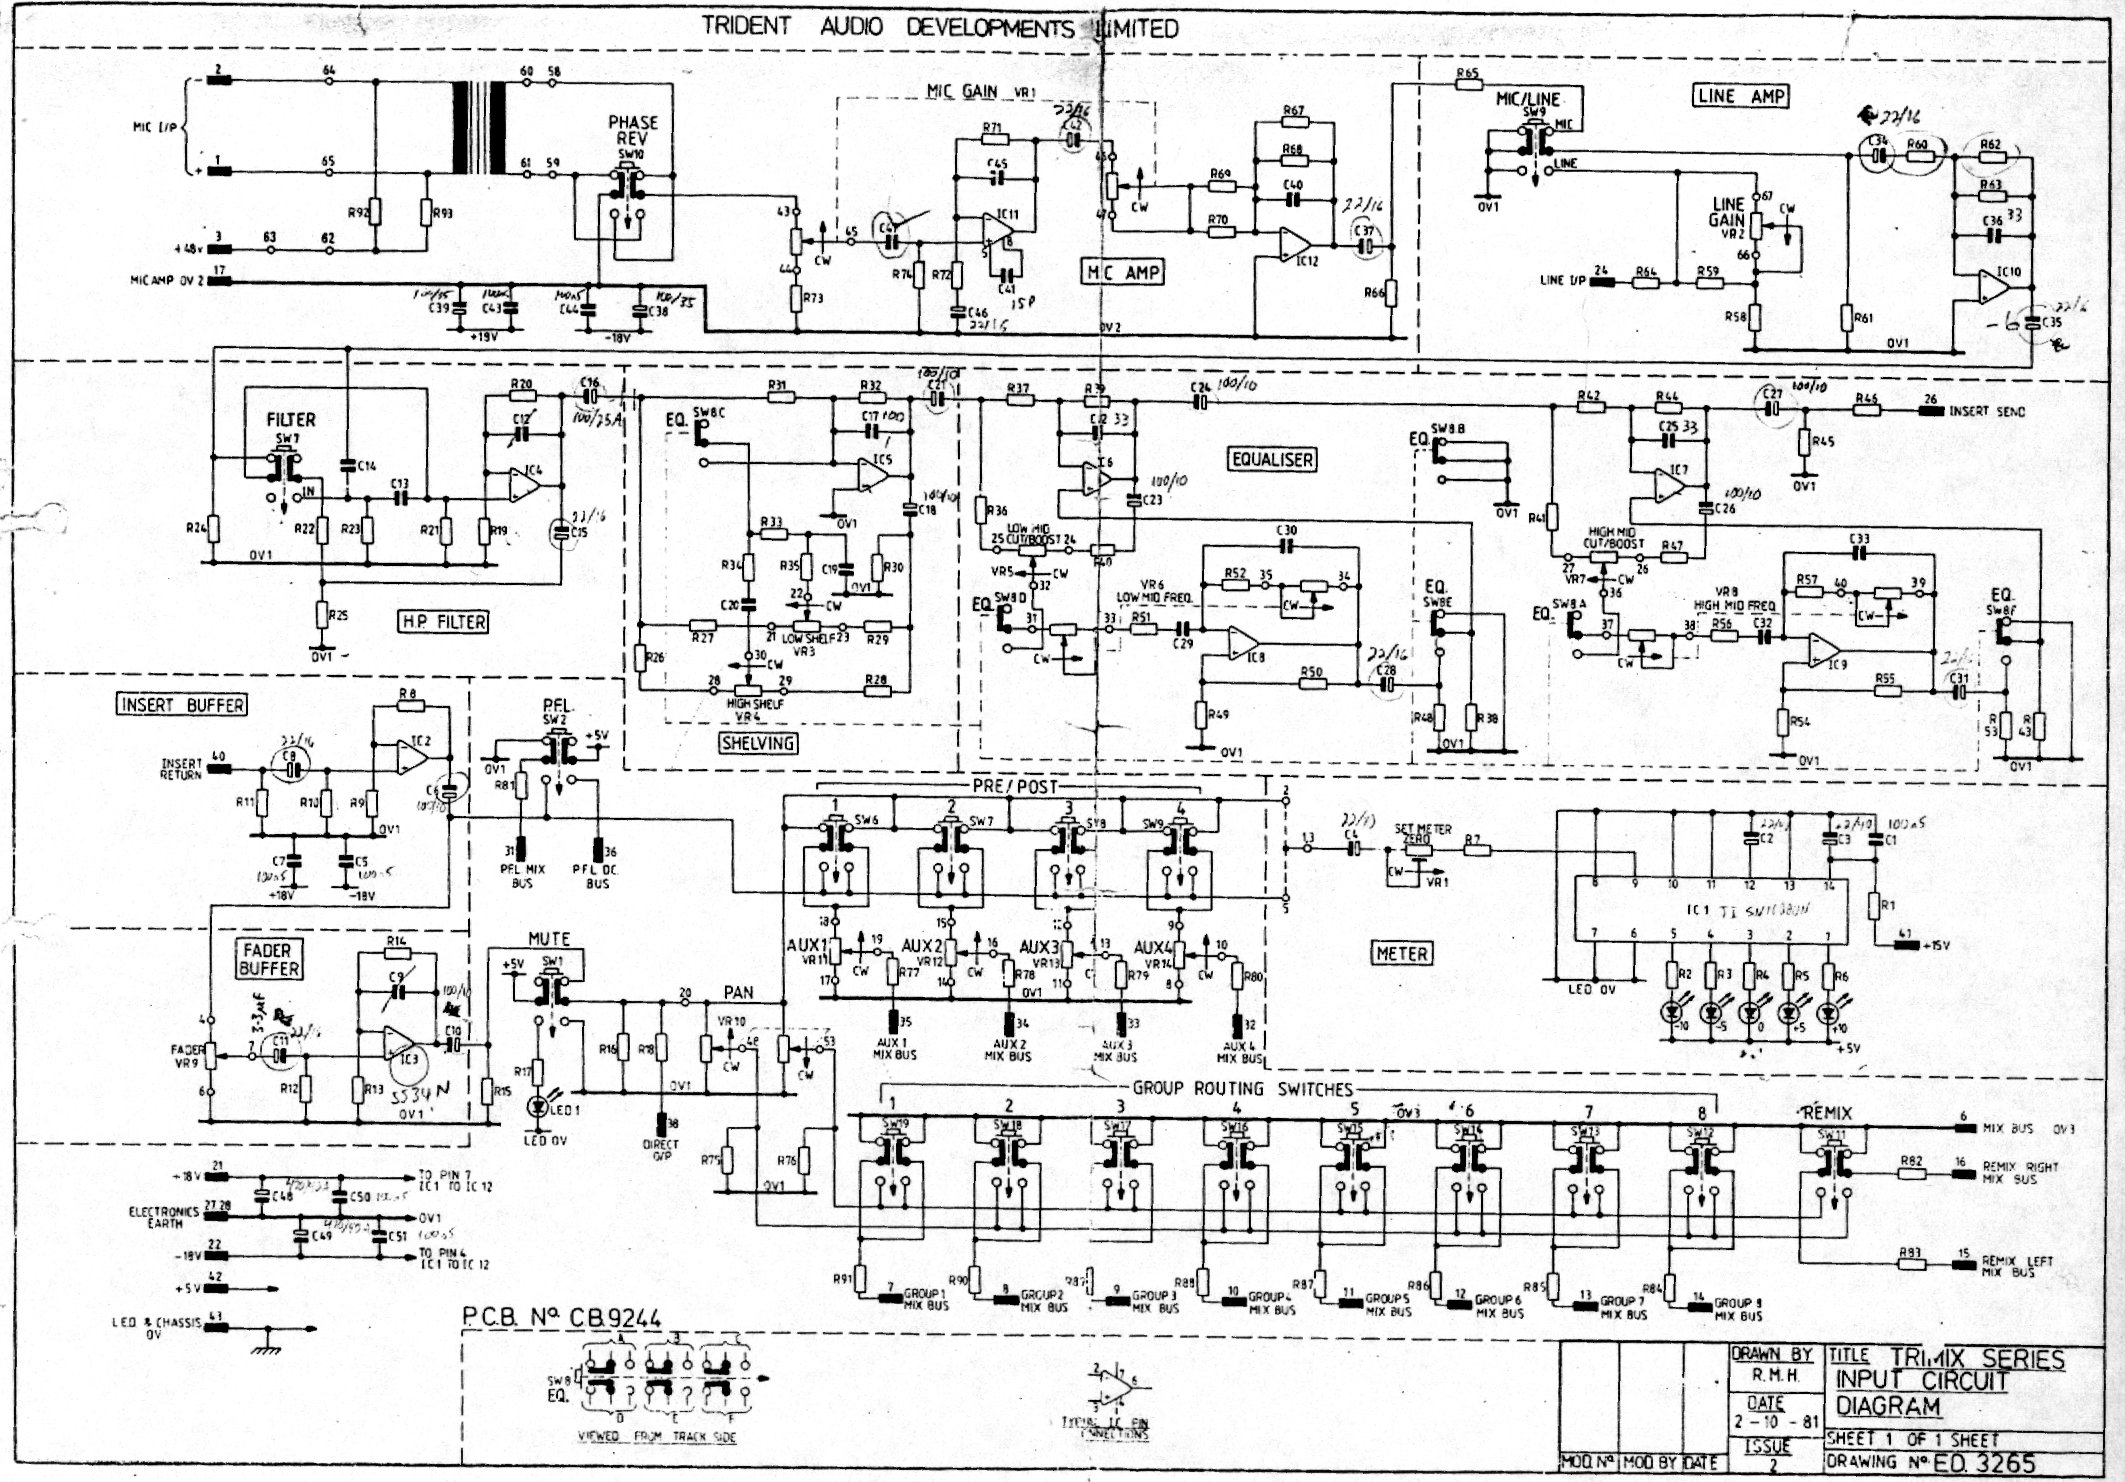 Trident Series 70 Eq Mod Help